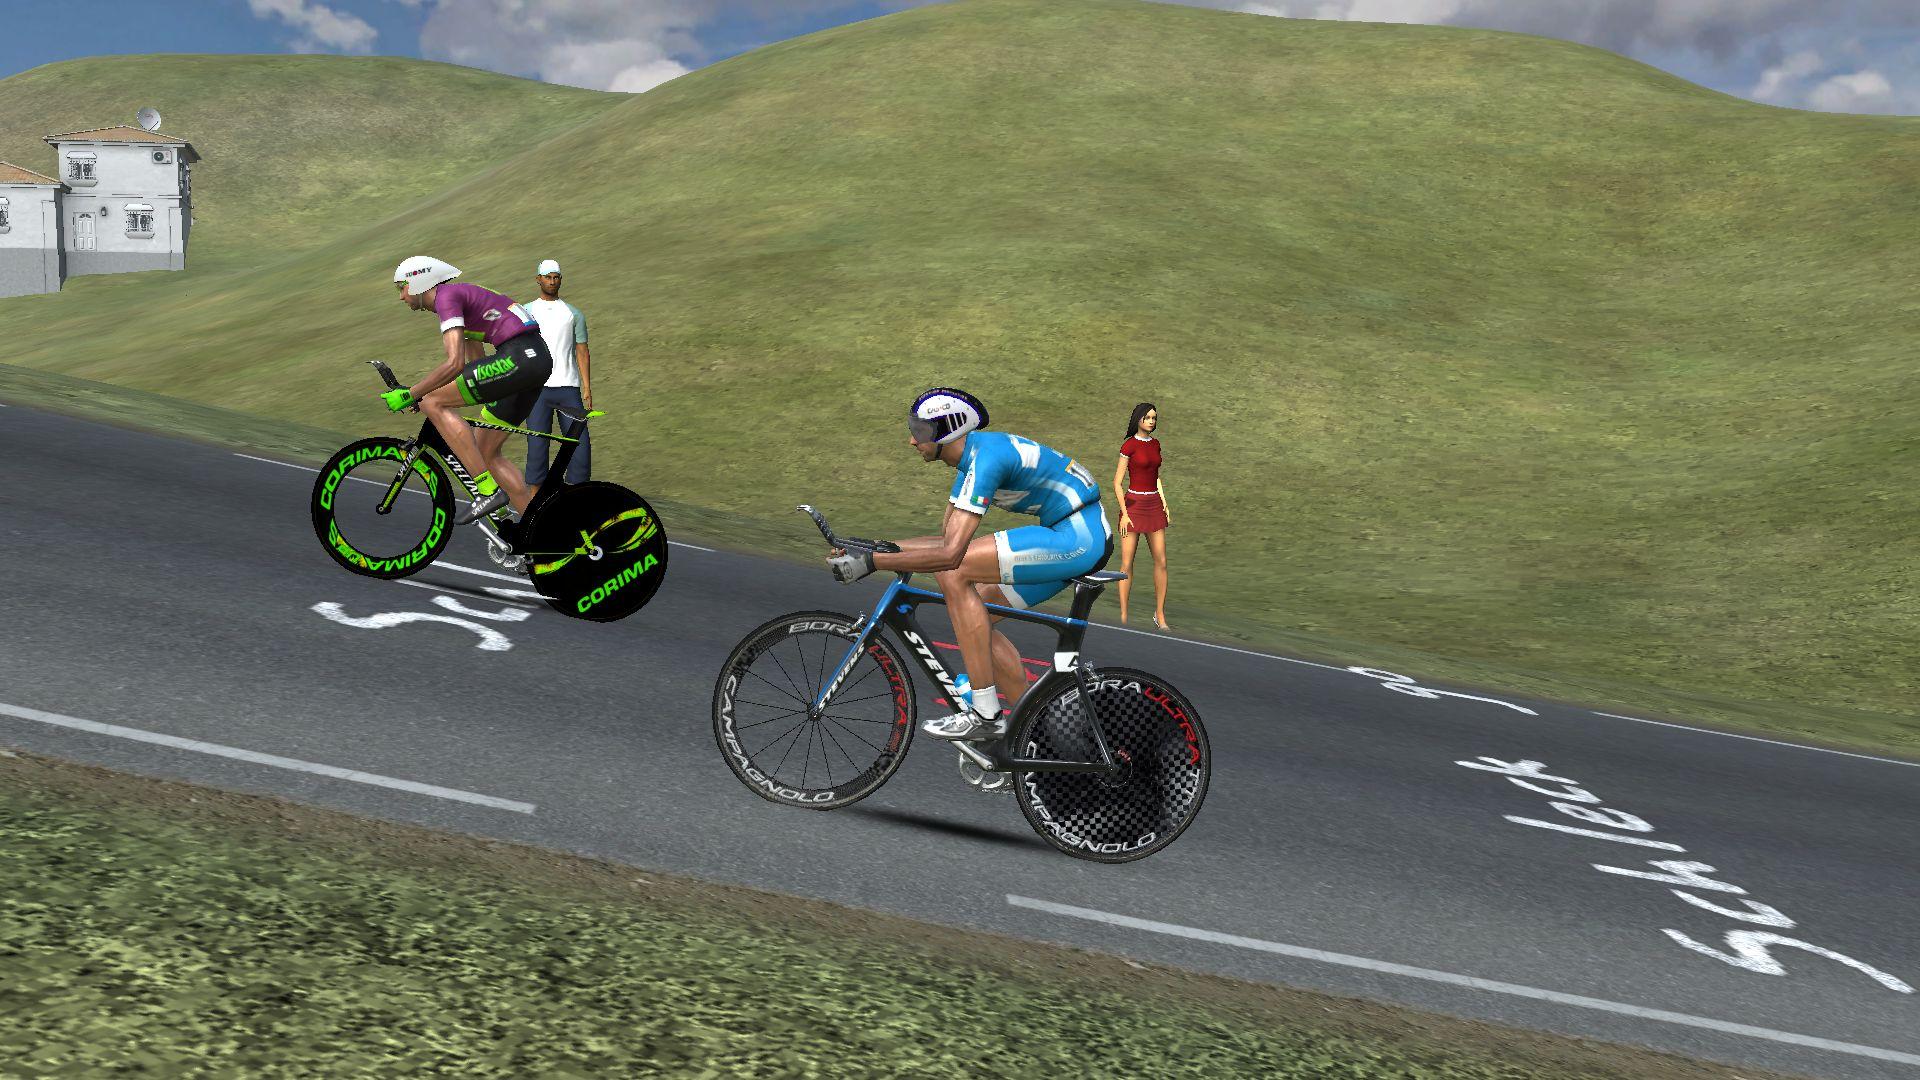 pcmdaily.com/images/mg/2019/Races/GTM/Giro/mg19_giro_09_PCM0042.jpg